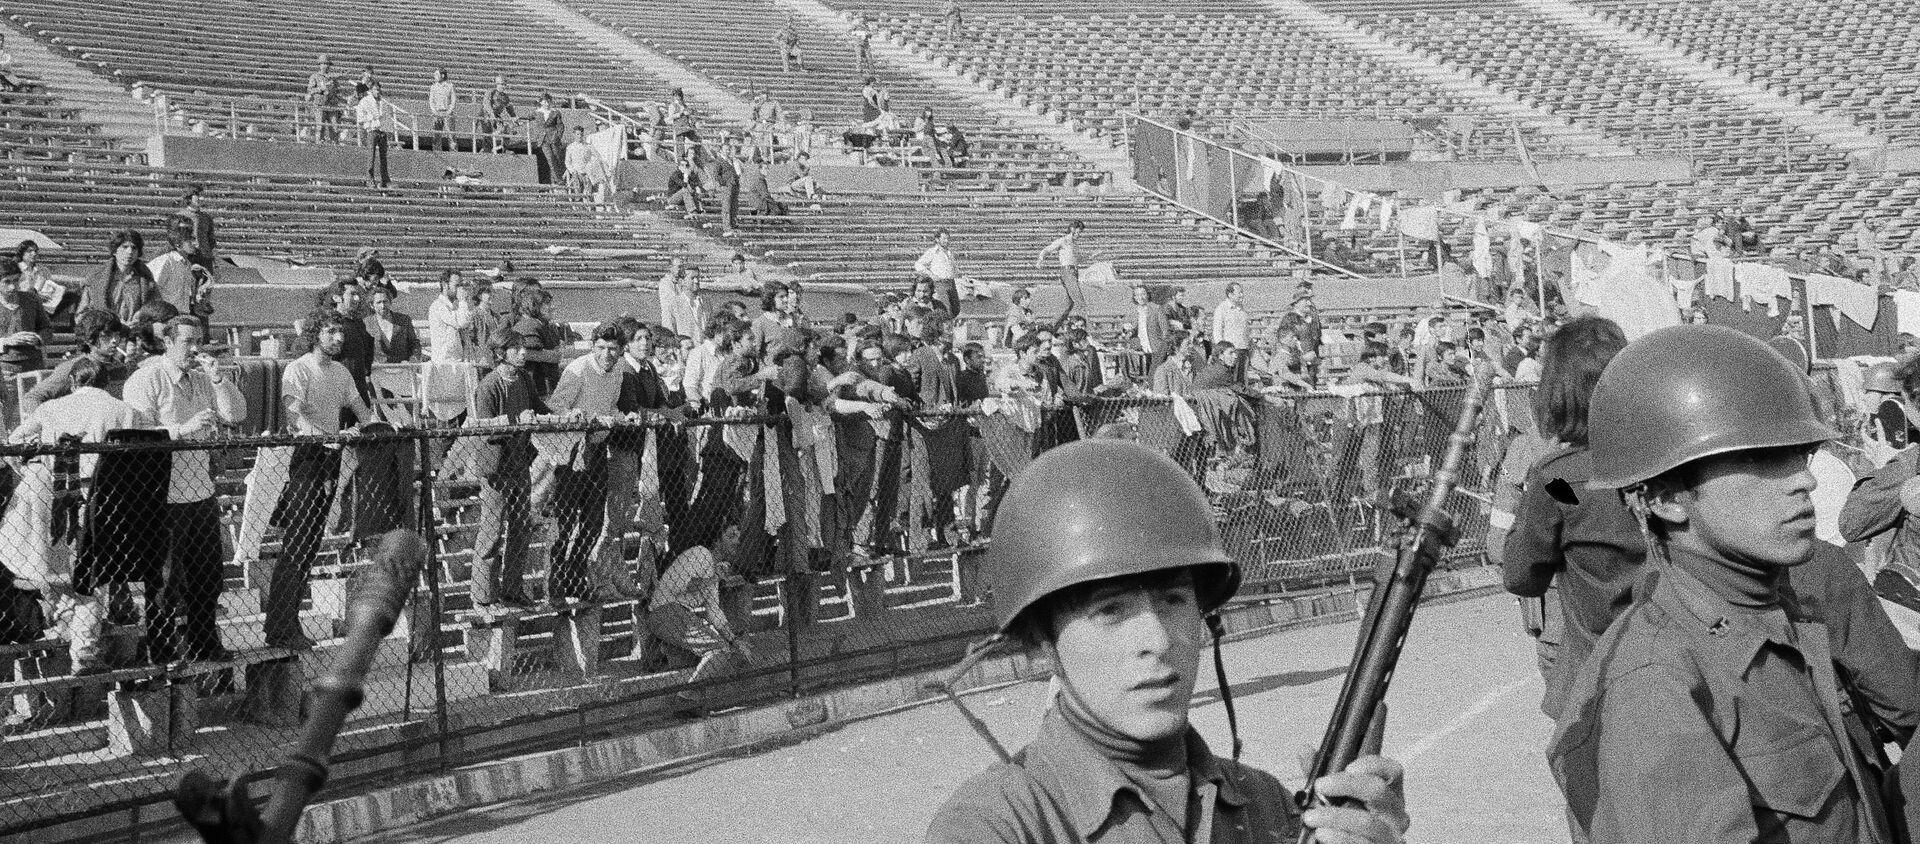 Golpe de Estado Chile 1973 - Sputnik Mundo, 1920, 18.11.2020